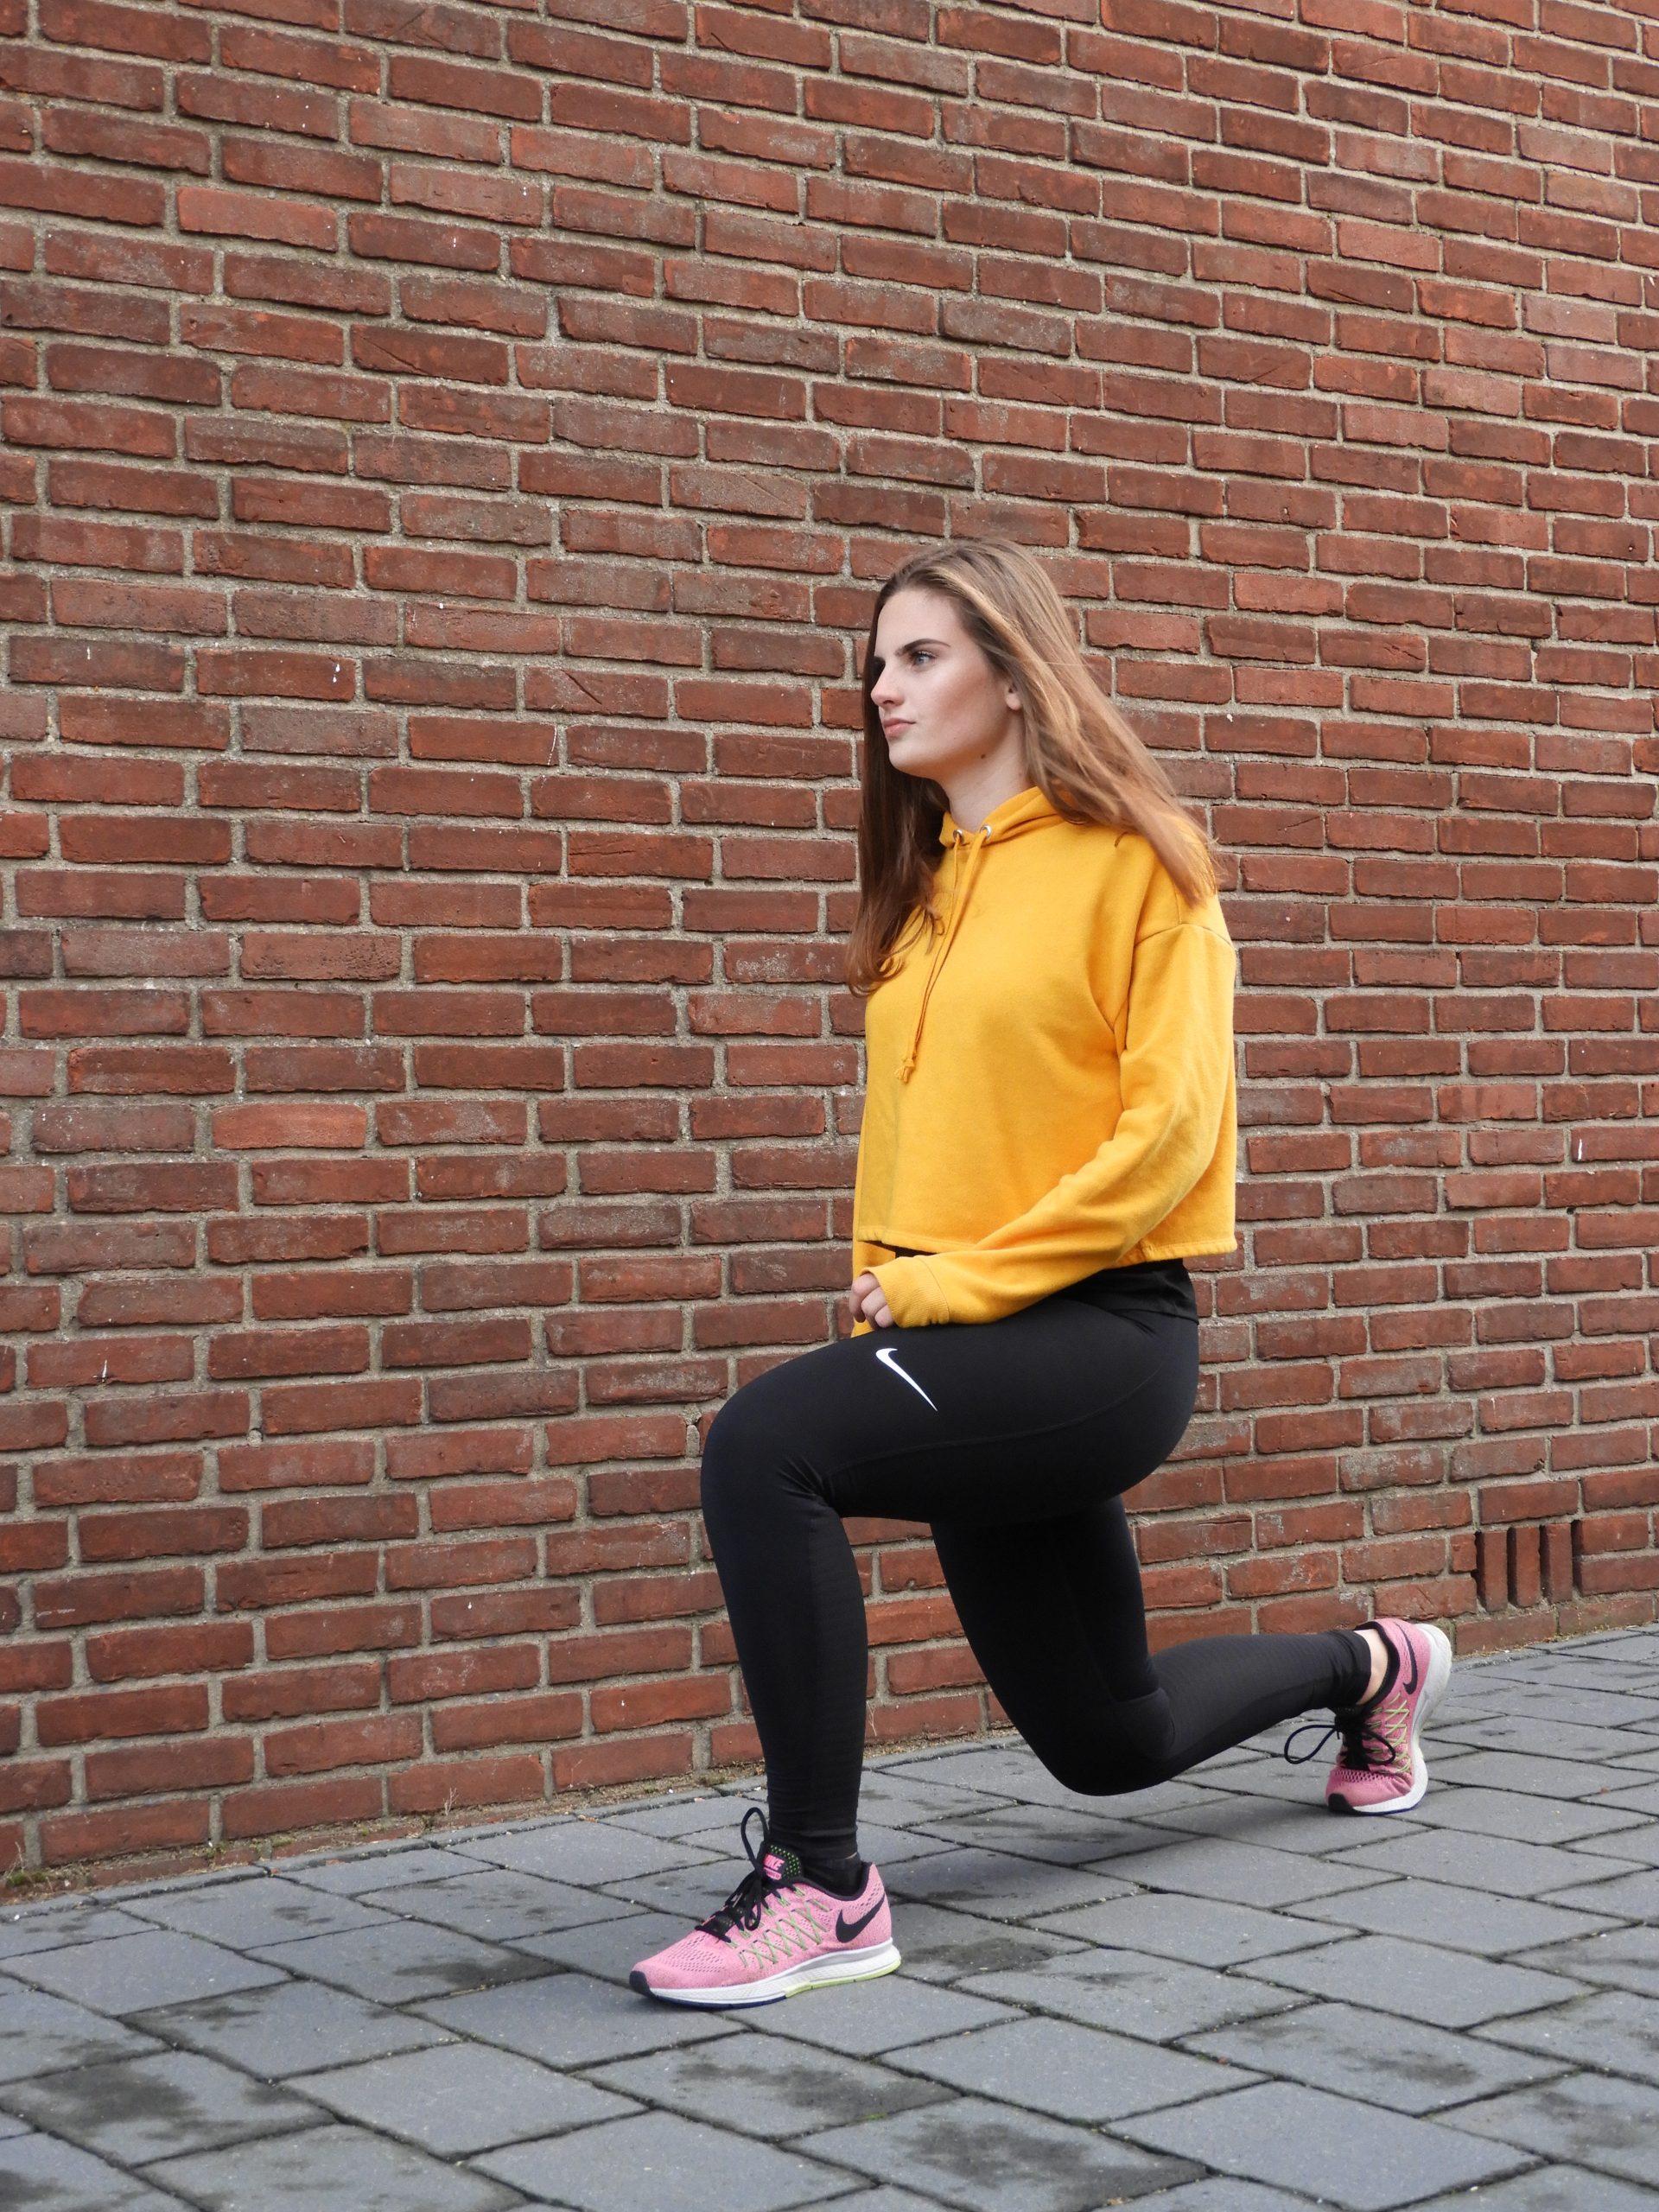 Mijn favoriete lichaamsgewicht oefeningen – workout ideeën